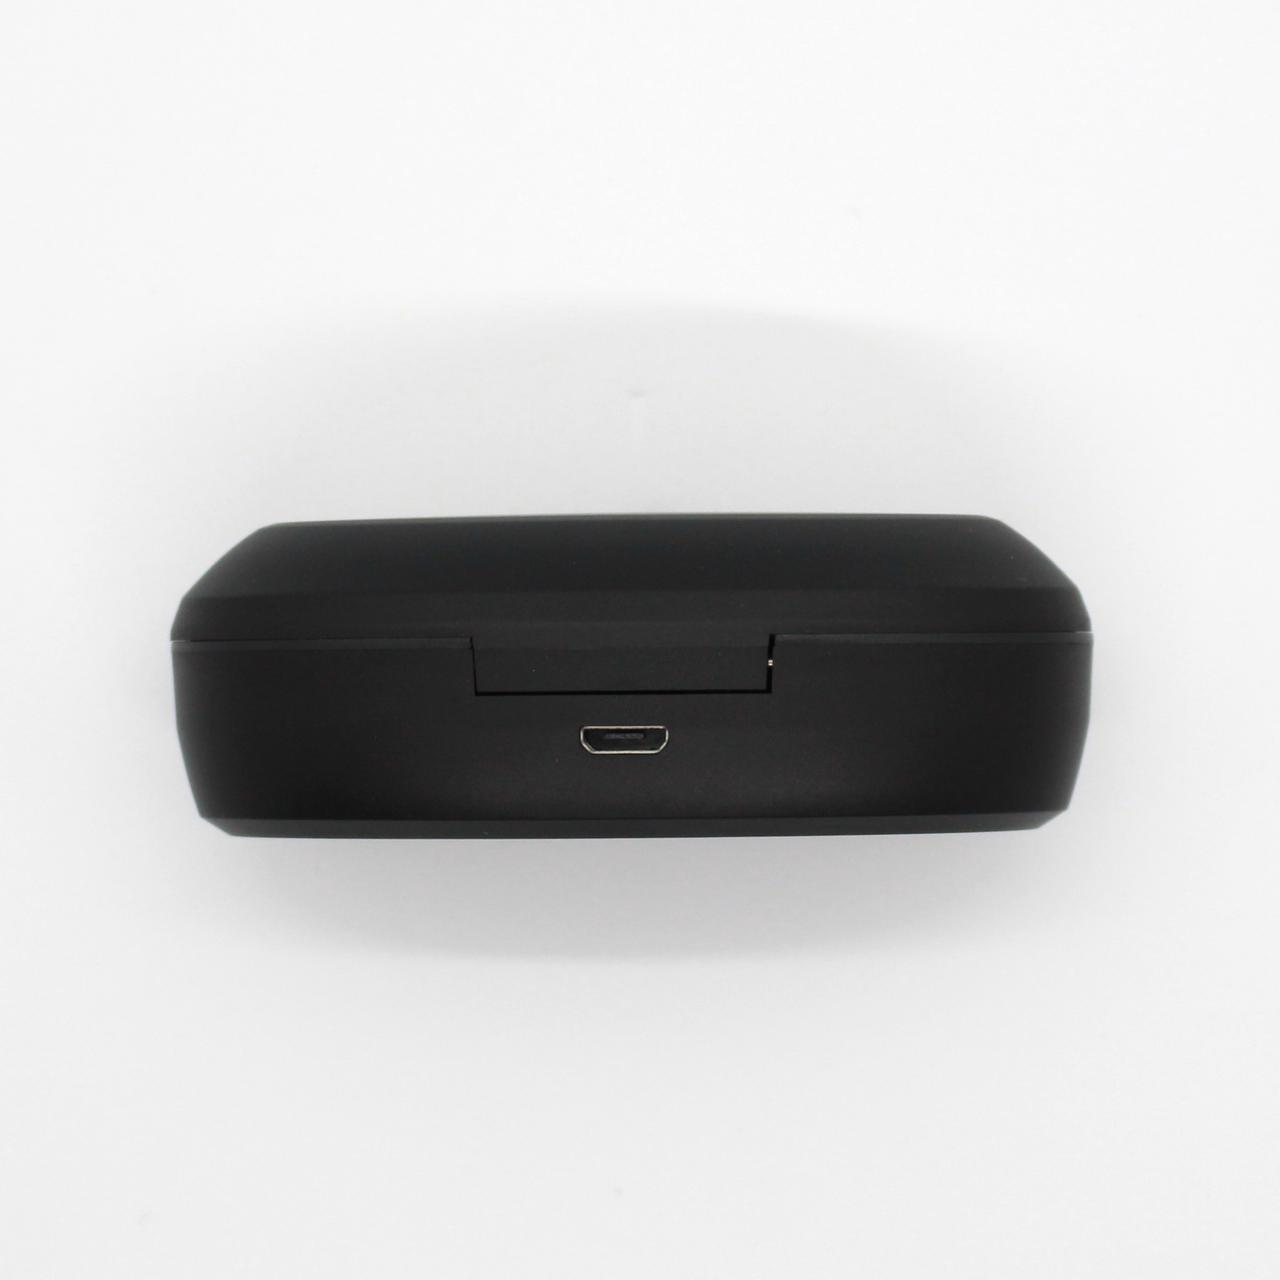 SOUNDPEATS TrueCapsule|背面にmicroUSBのポートを備えています